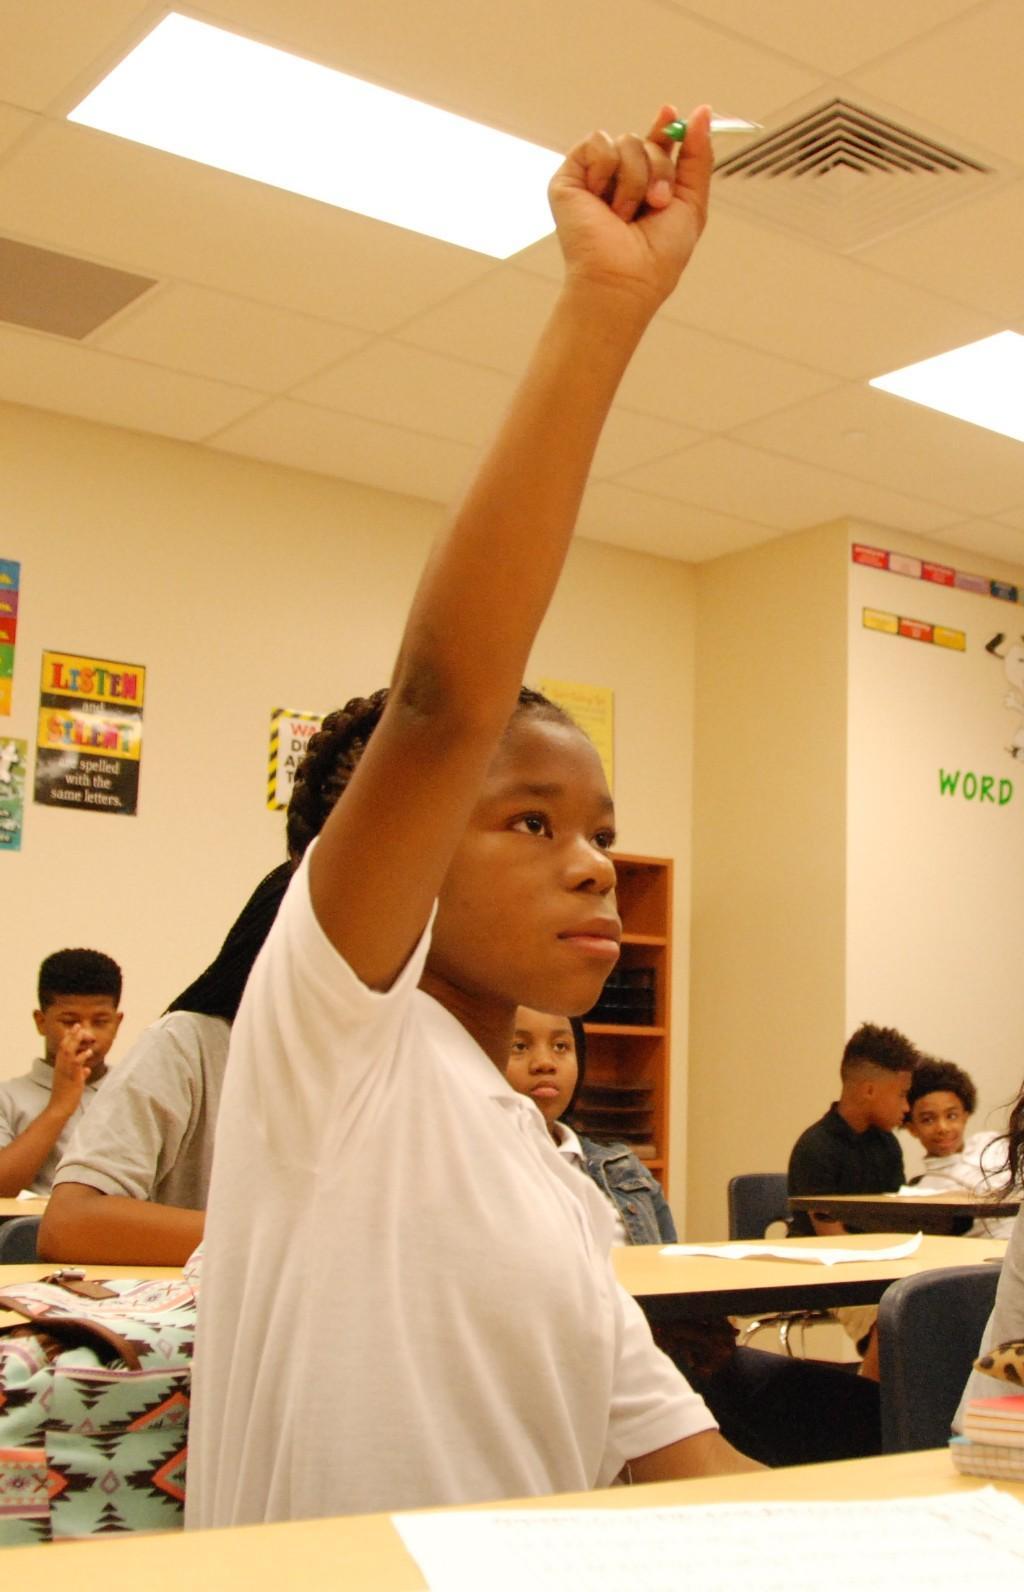 Raised hand, question - Elite Academy, 2016-17